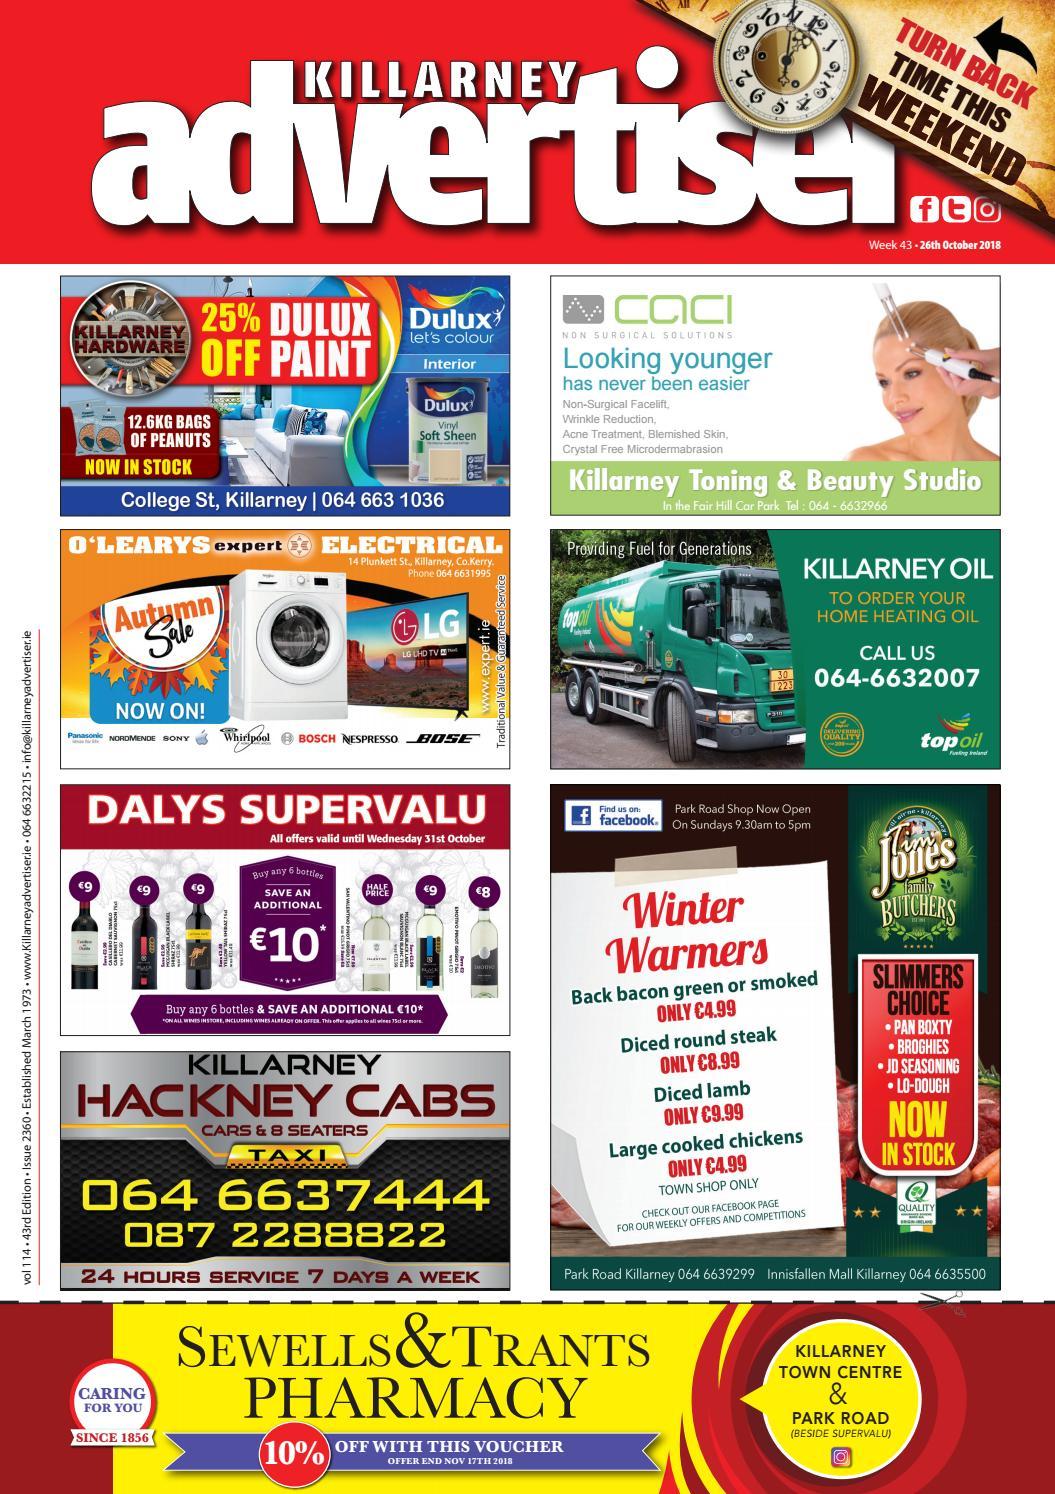 Killarney Dating Site, 100% Free Online Dating in Killarney, MB